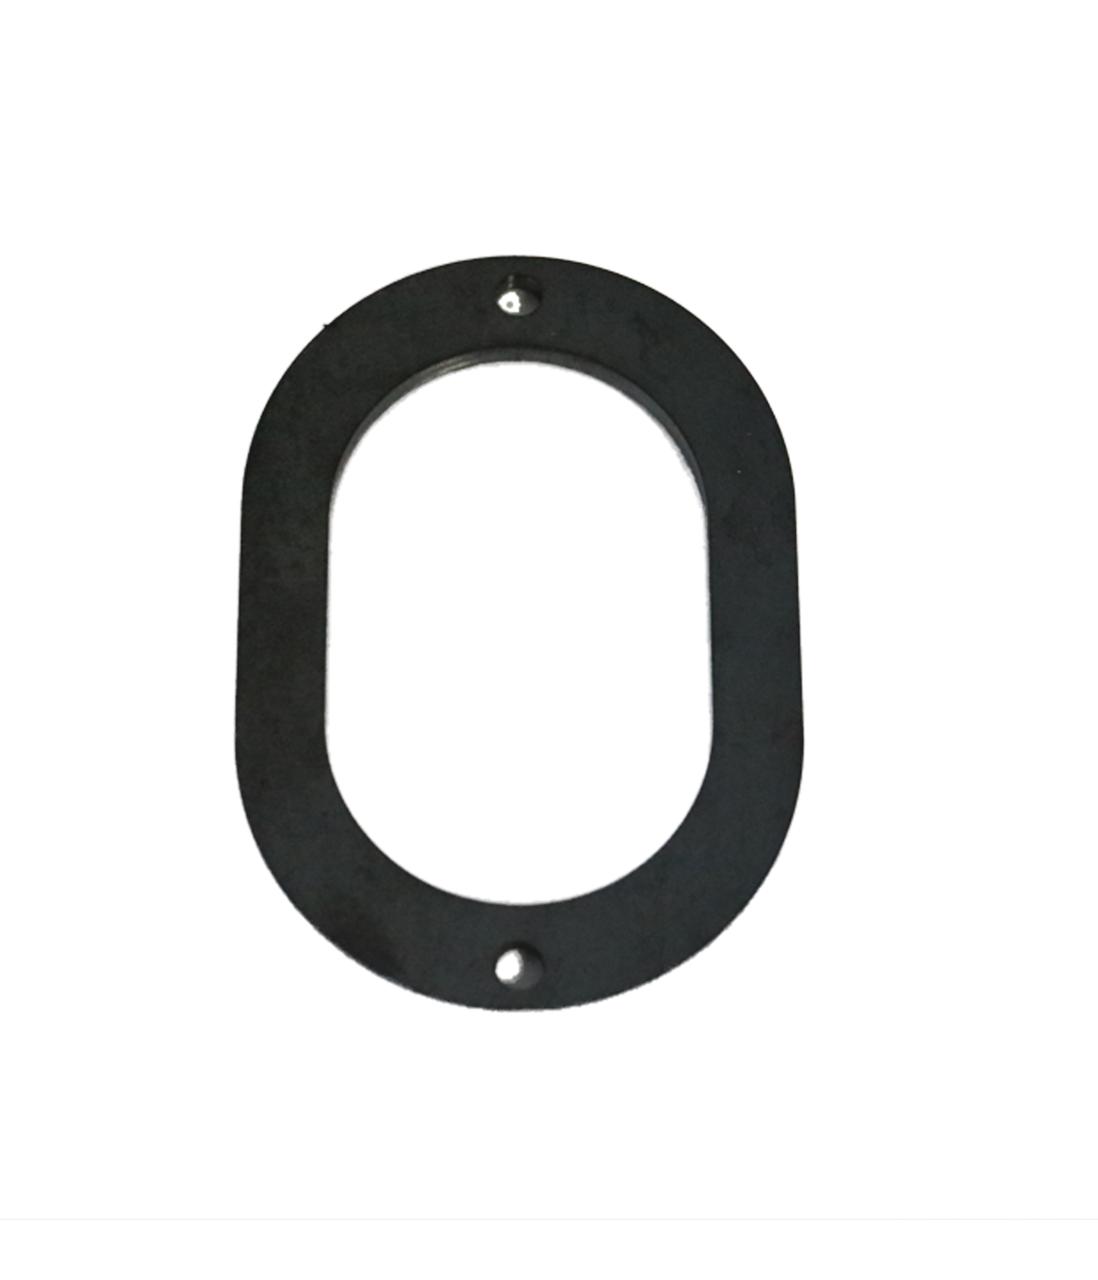 Oval  Collector Flange, Mild Steel